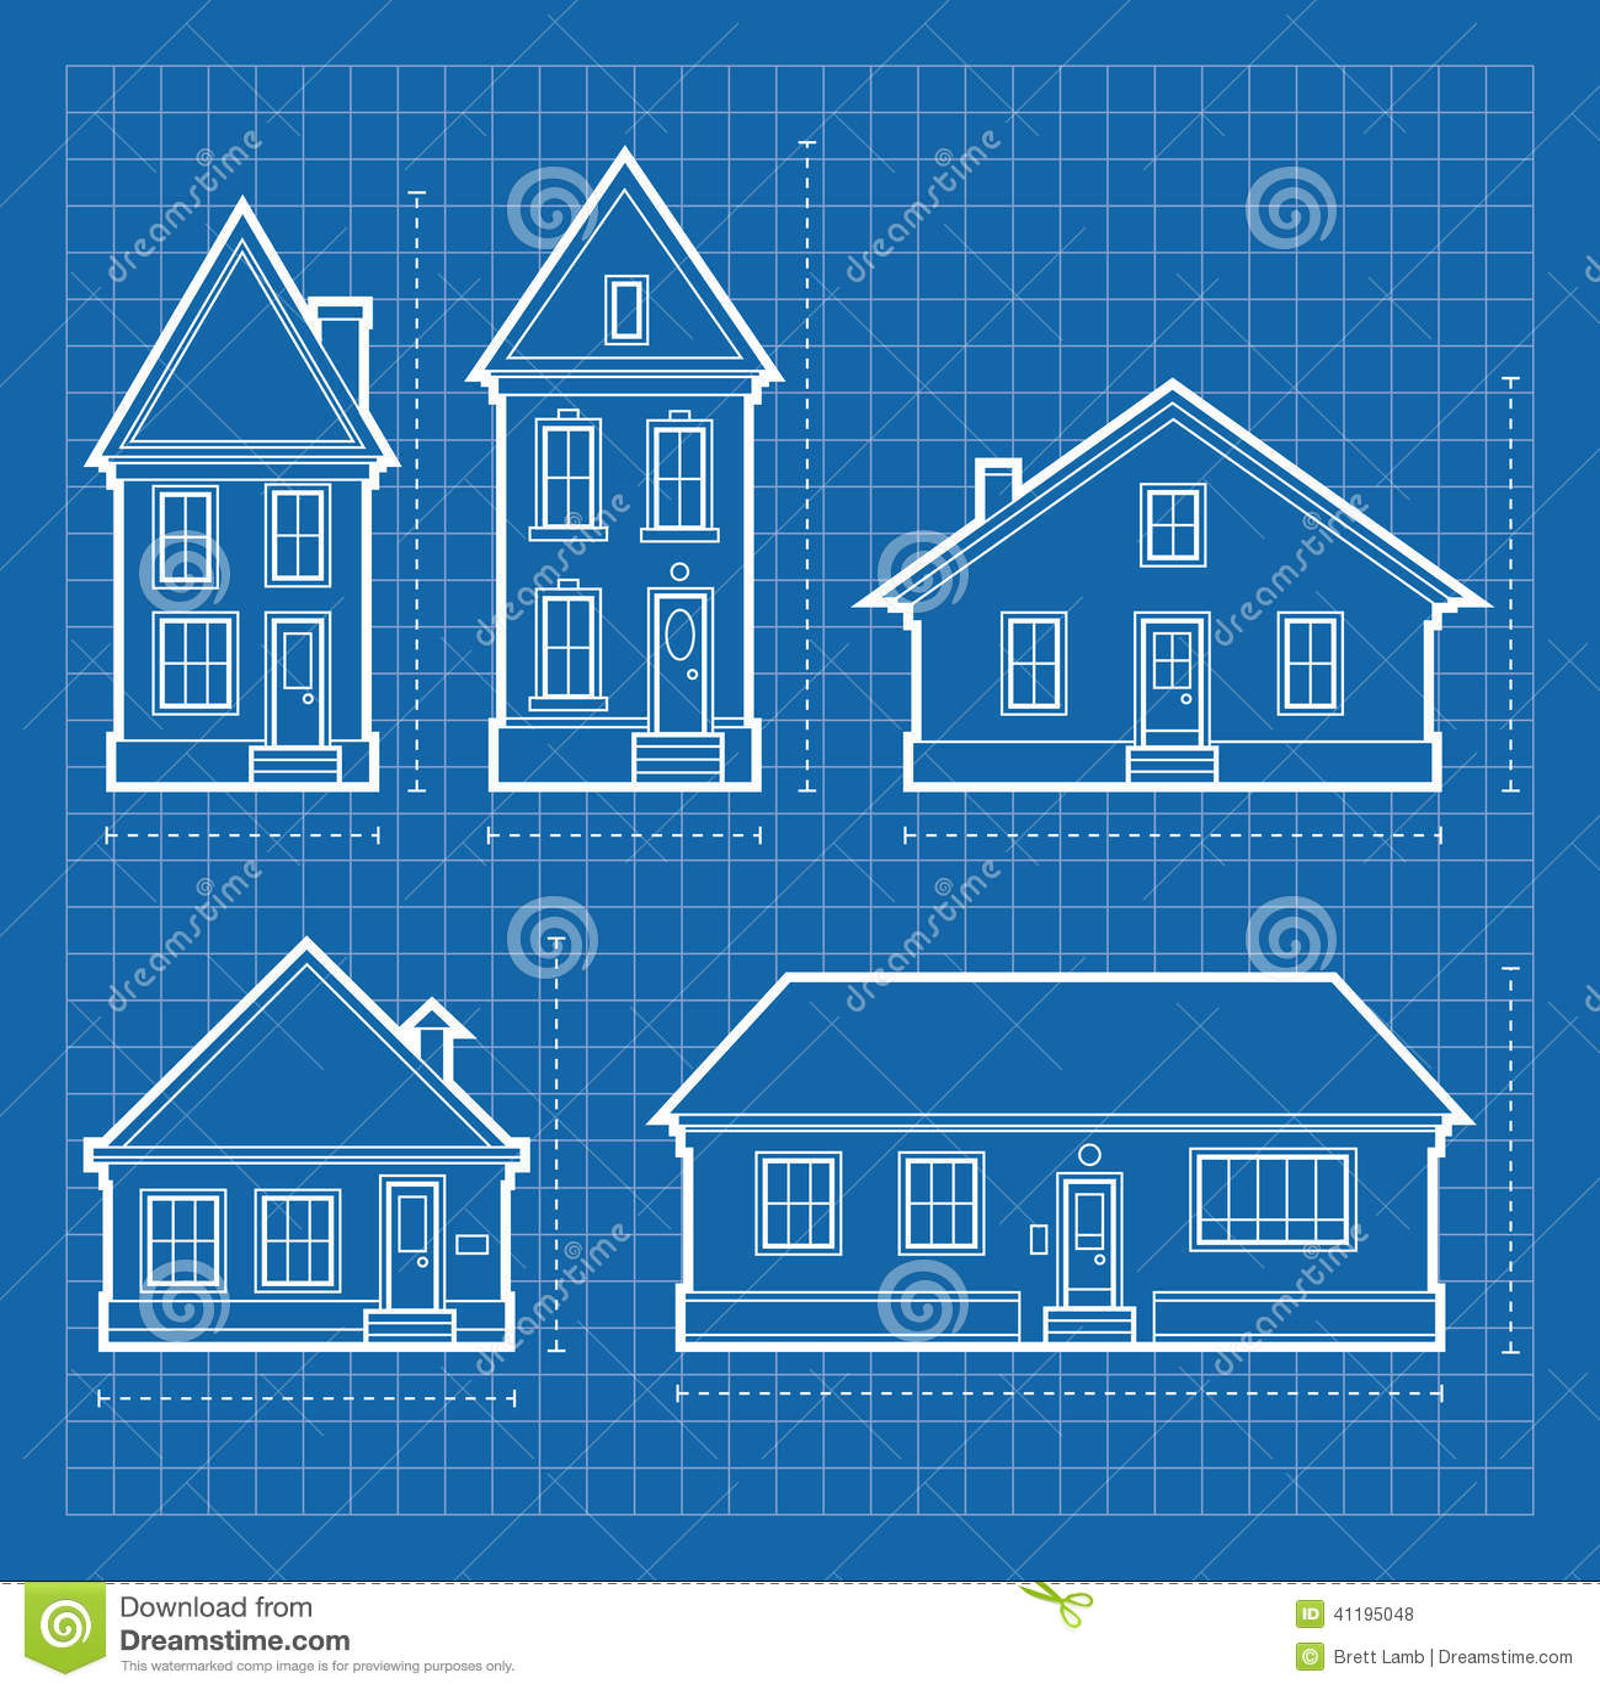 House Blueprints stock illustration. Illustration of blue - 41195048